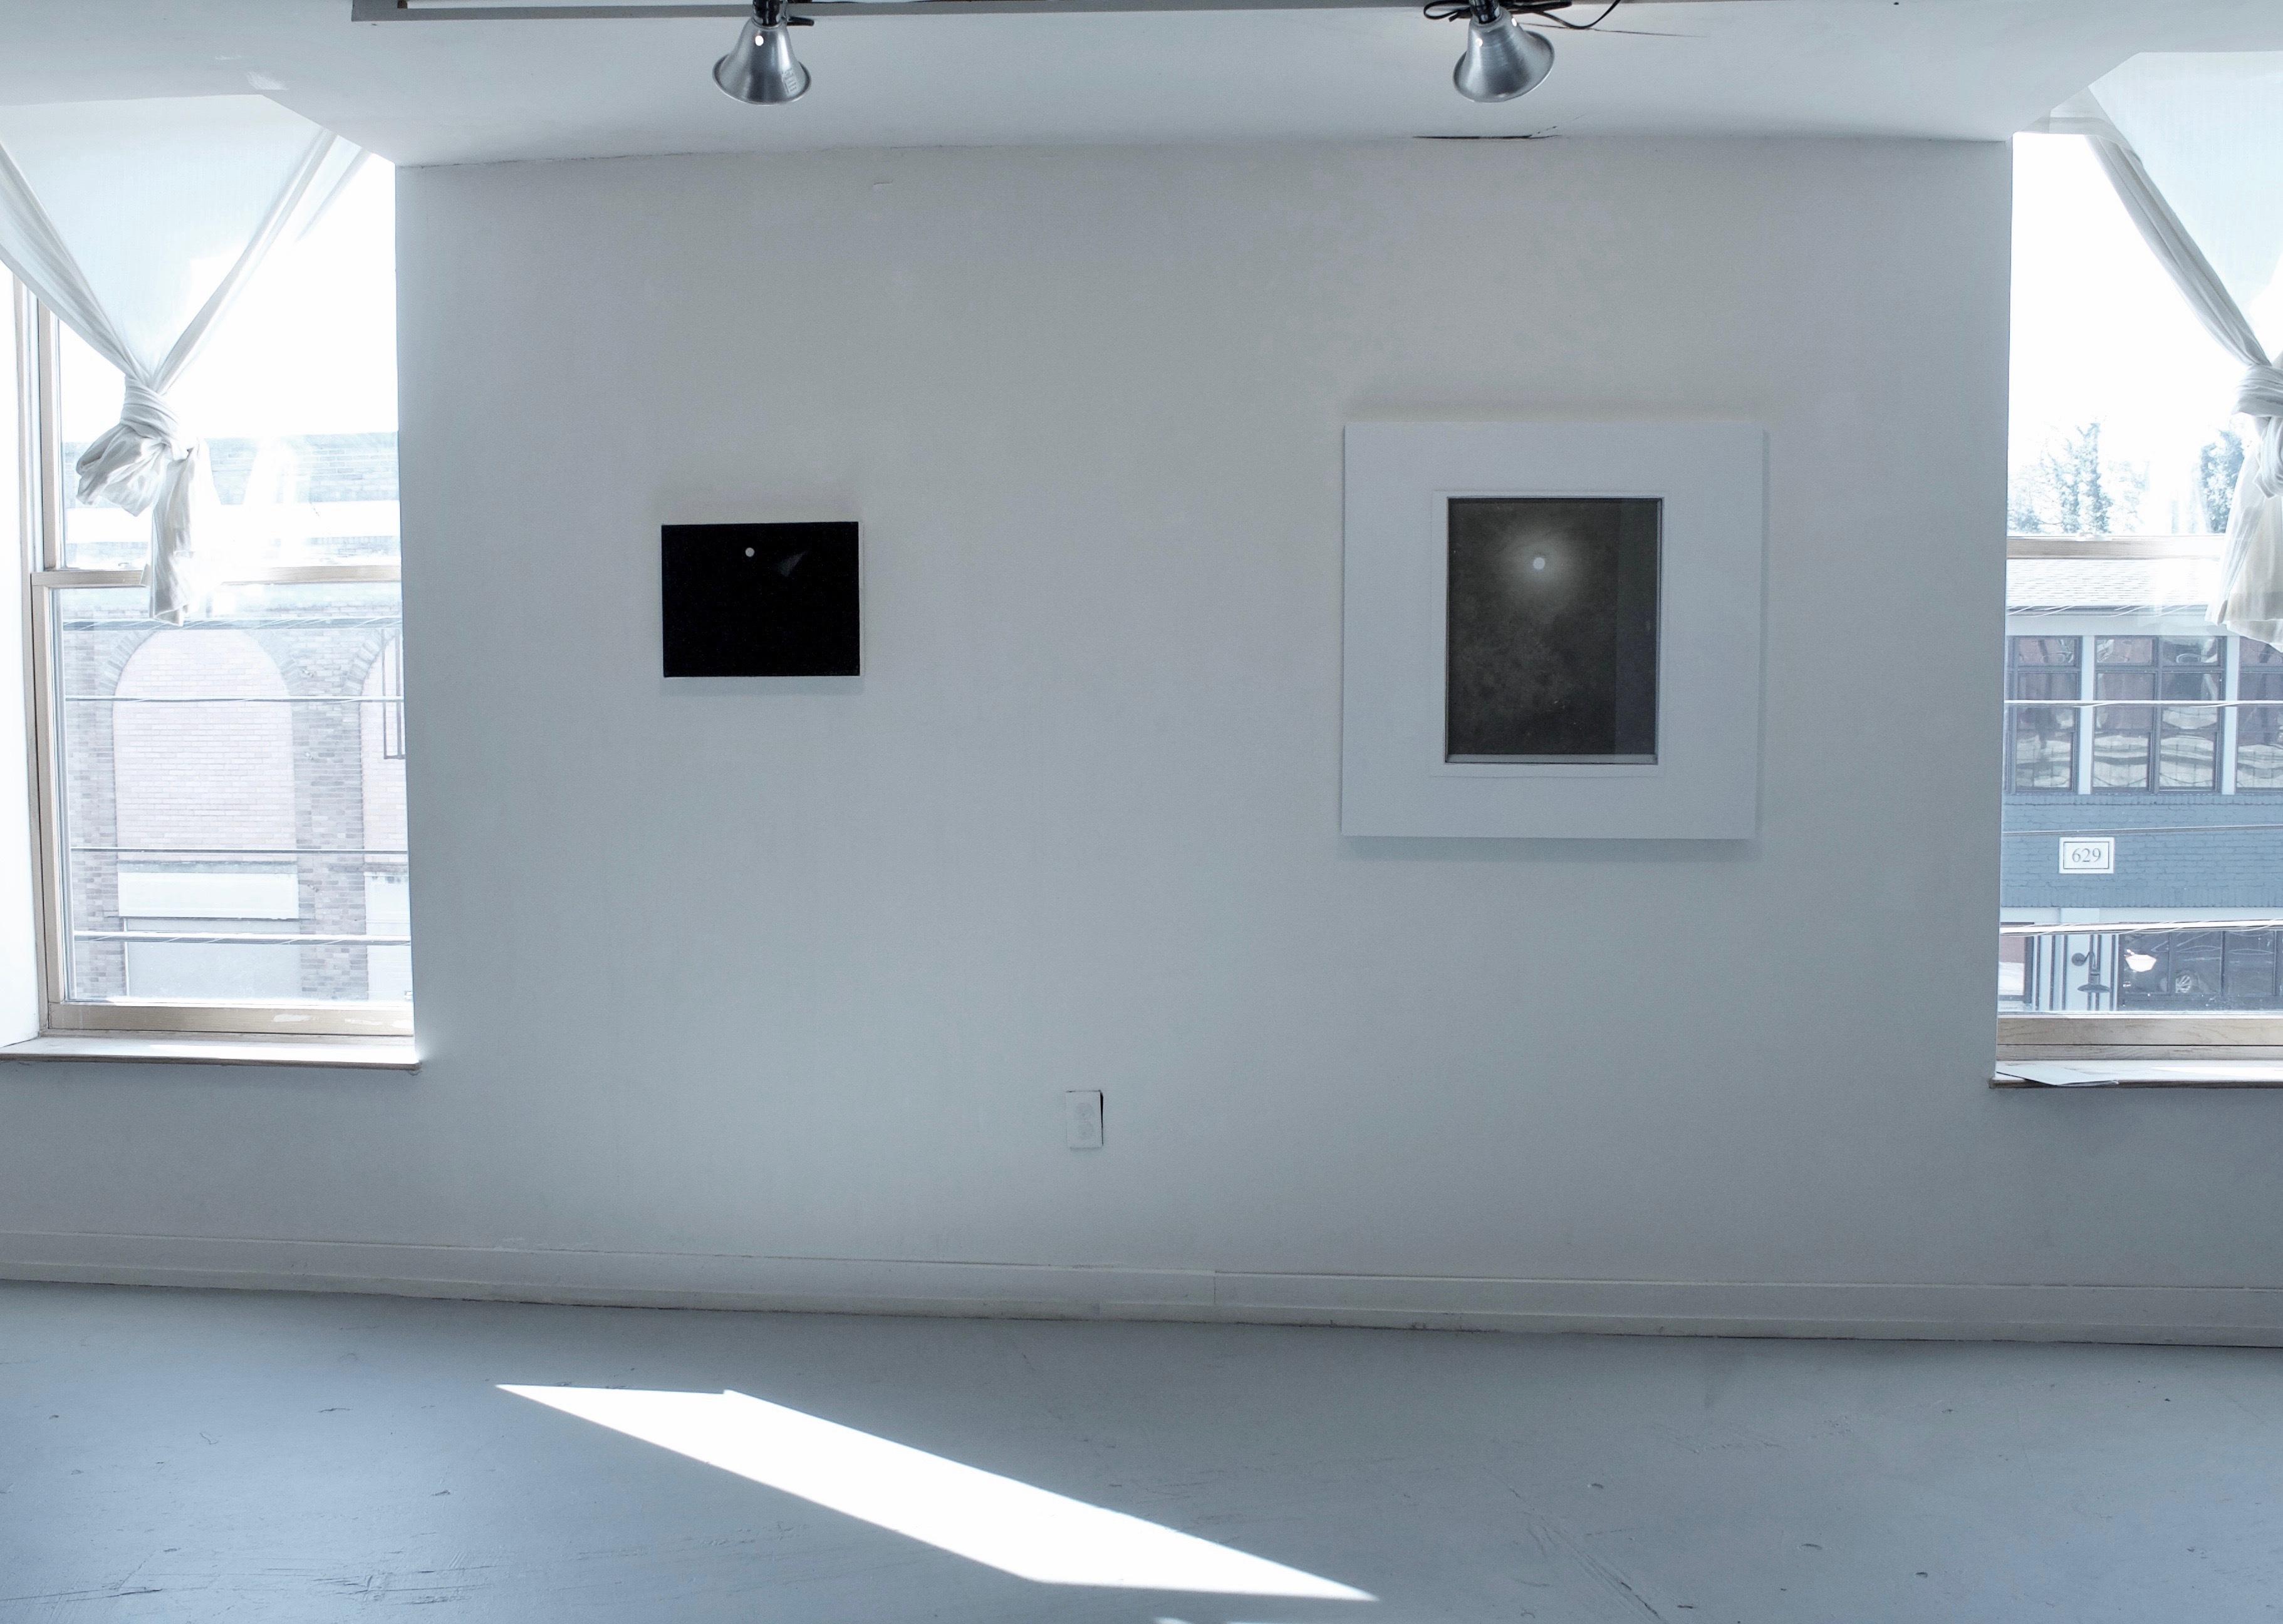 Gallery Visit, Fluorescent Gallery (feat. Thomas Wharton), Knoxville, TN, November 2017